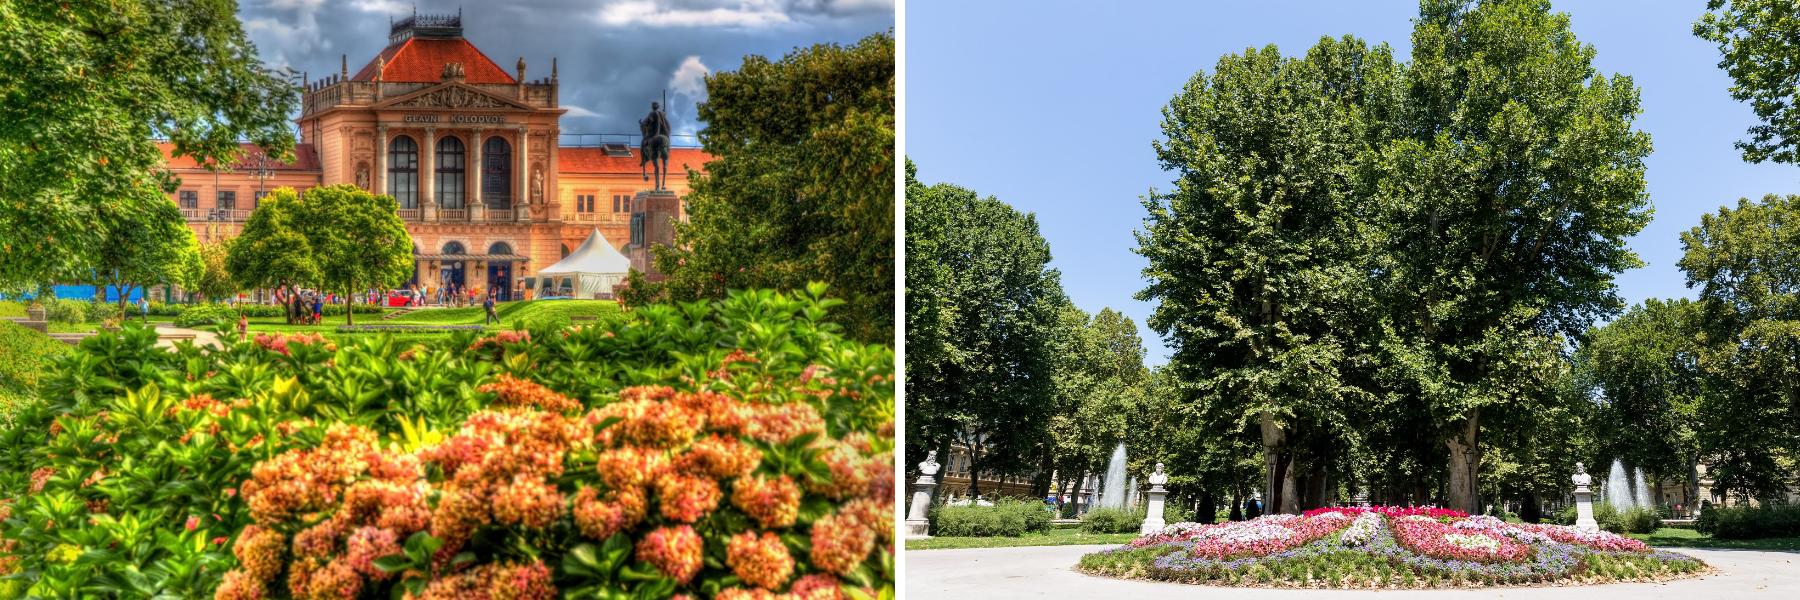 Zrinjevac park, Unforgettable Croatia